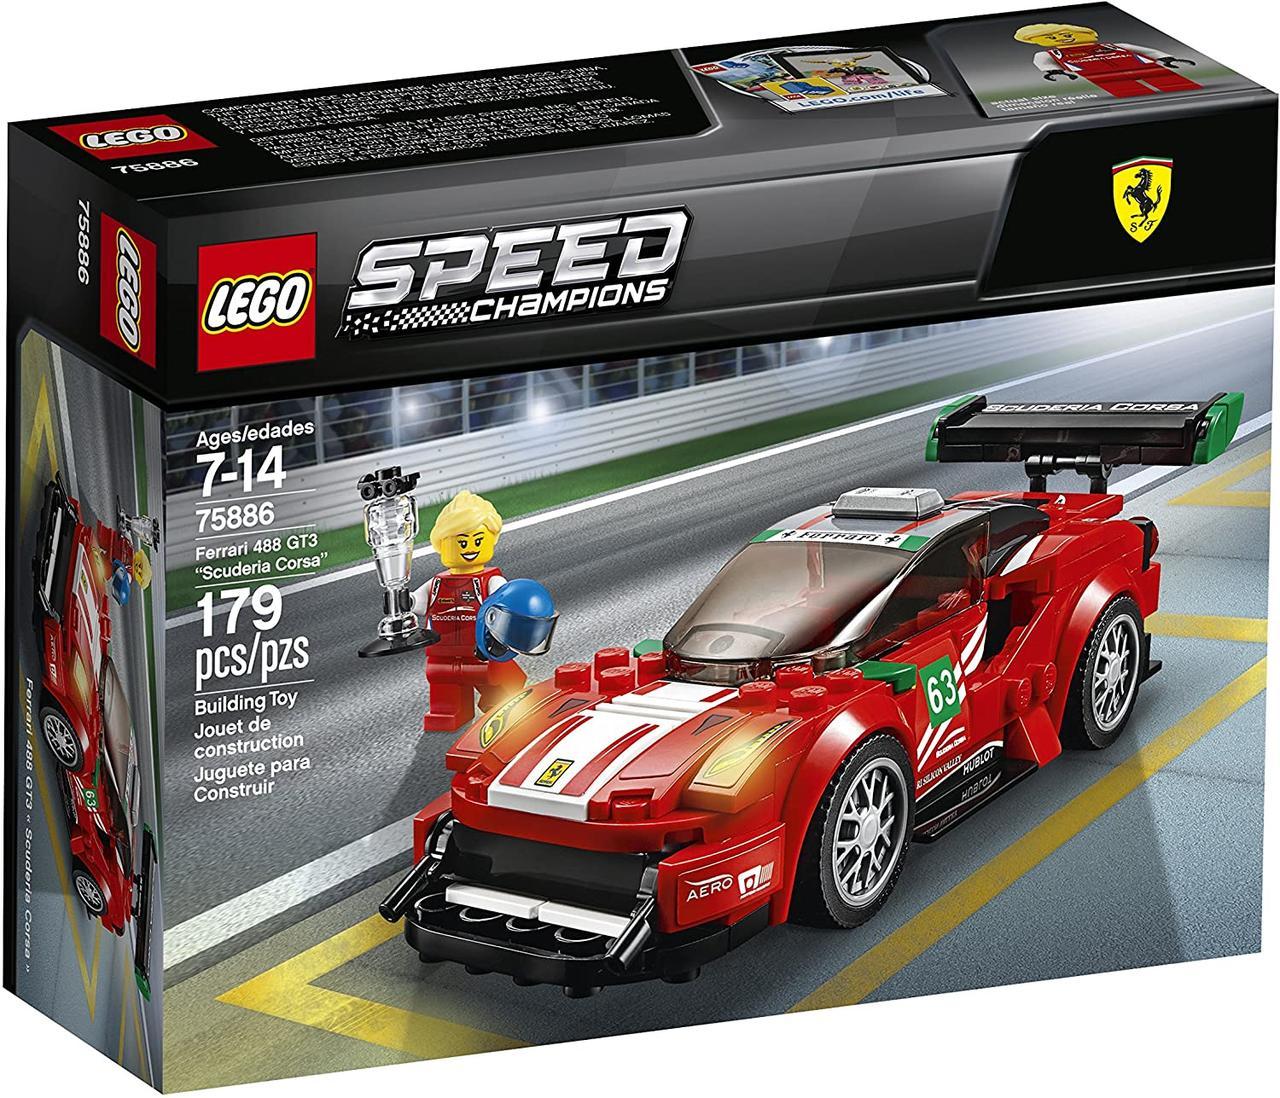 Конструктор LEGO Speed Champions 75886 Ferrari 488 GT3 Scuderia Corsa